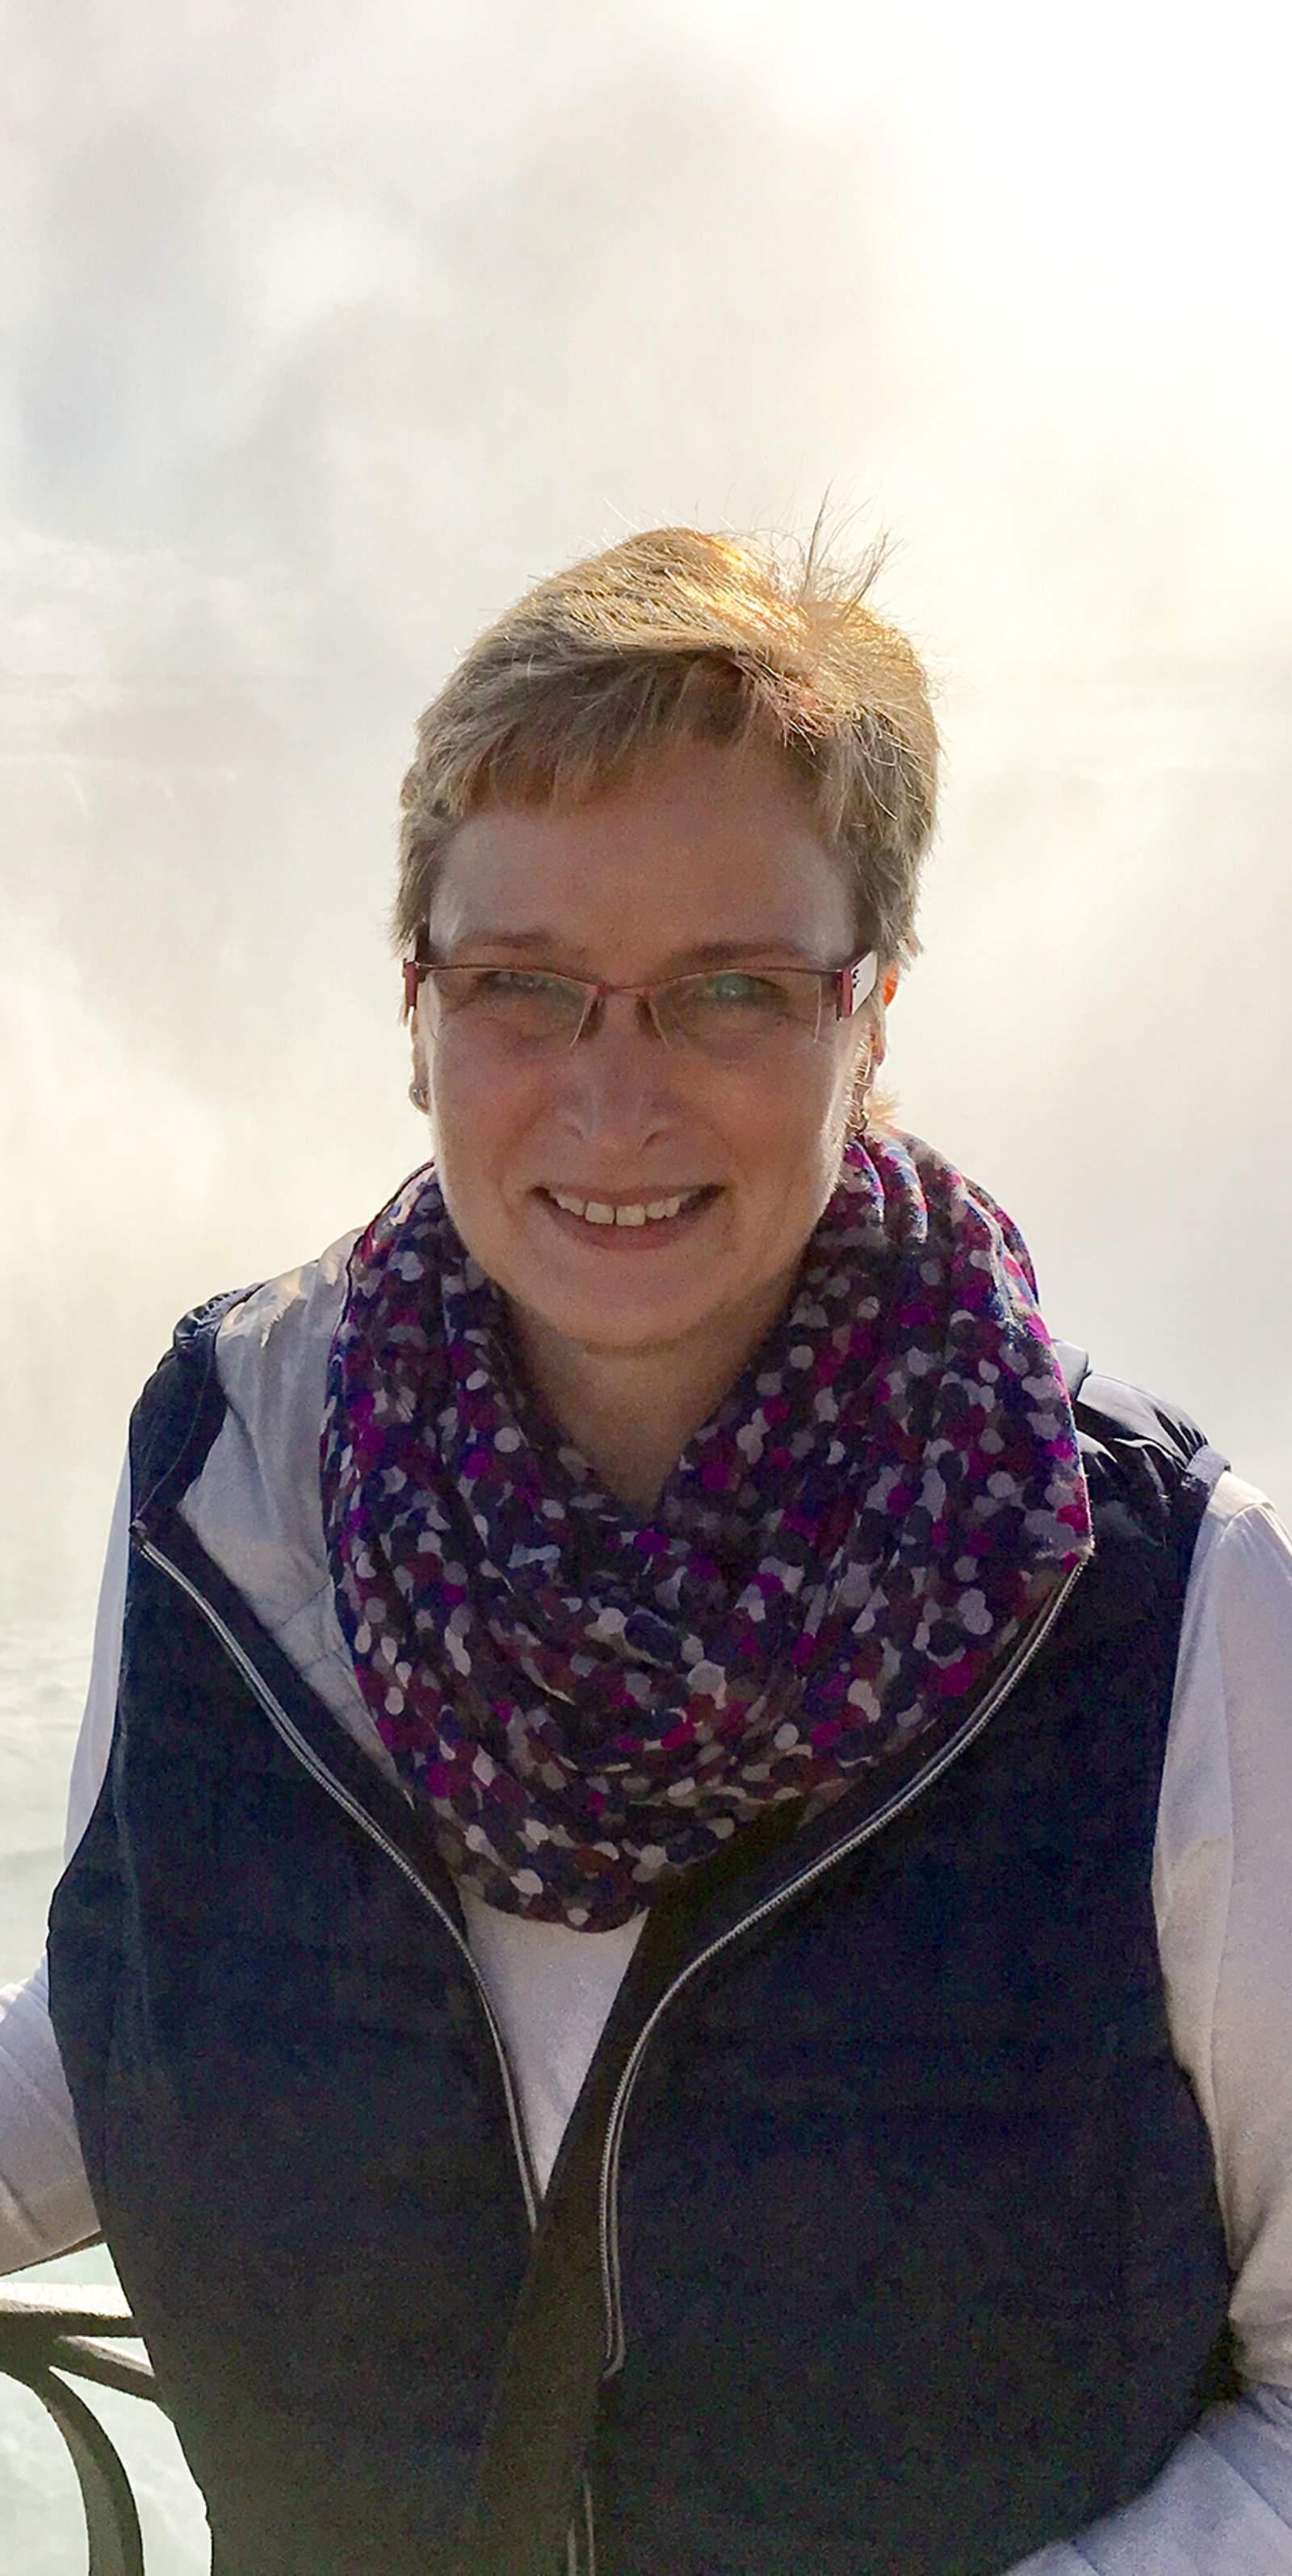 Mitarbeiterin Dagmar bei den Niagarafällen